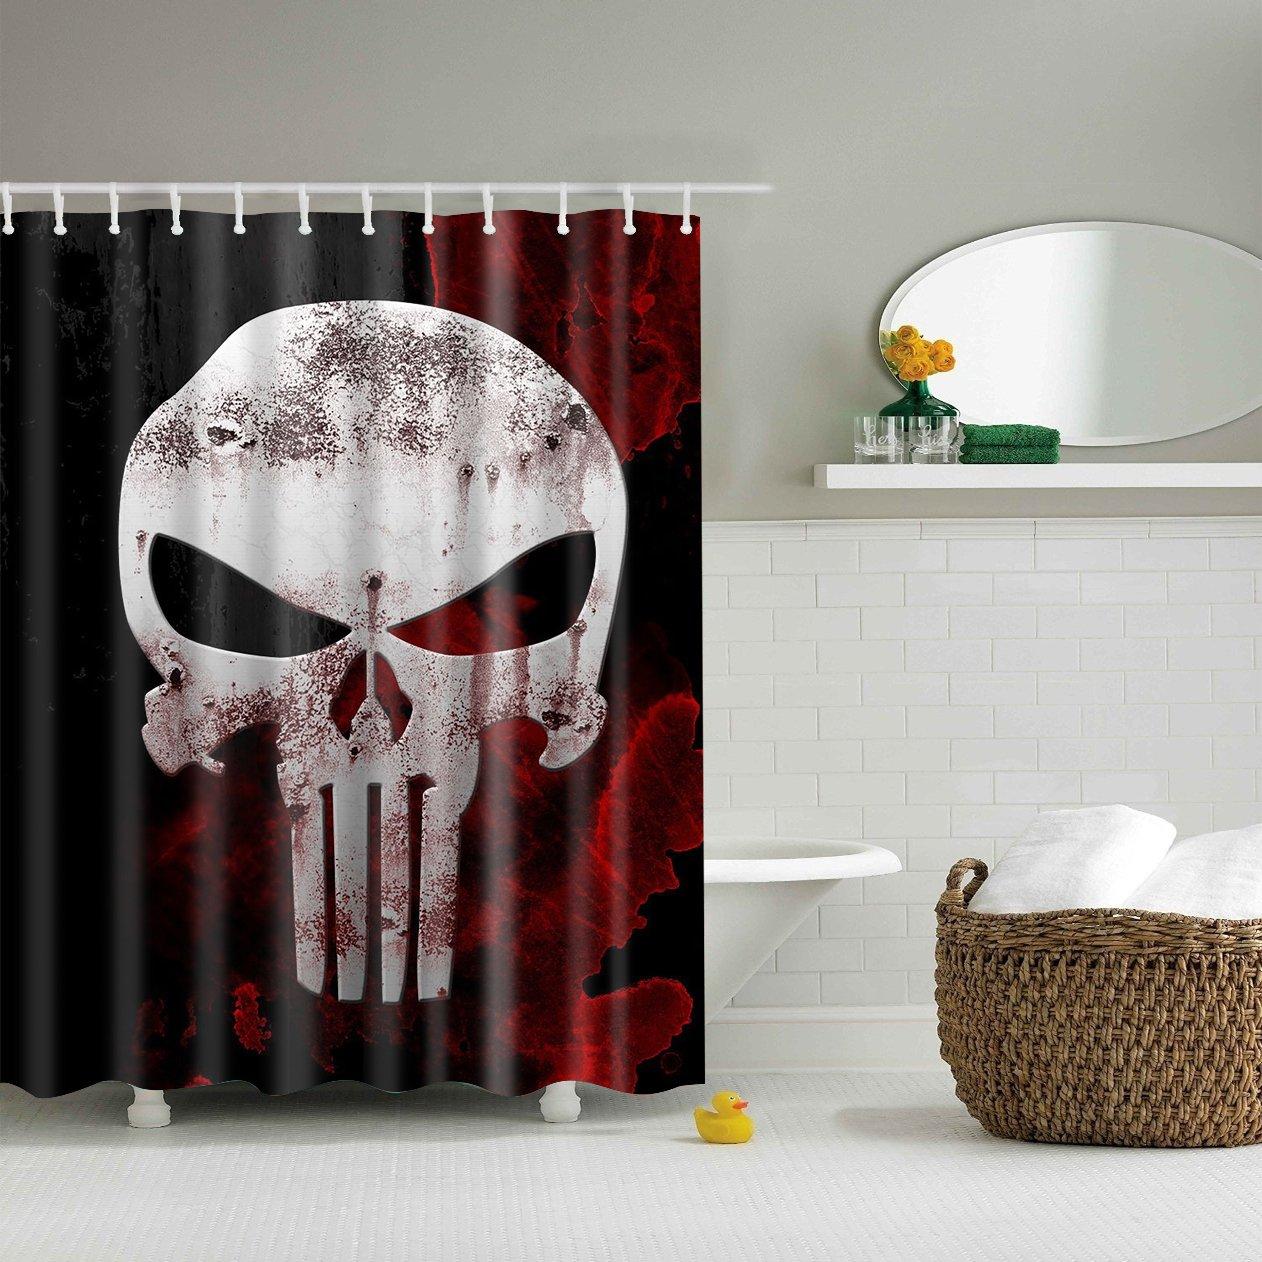 Punisher Shower Curtain Red And Black Bath Decor Halloween